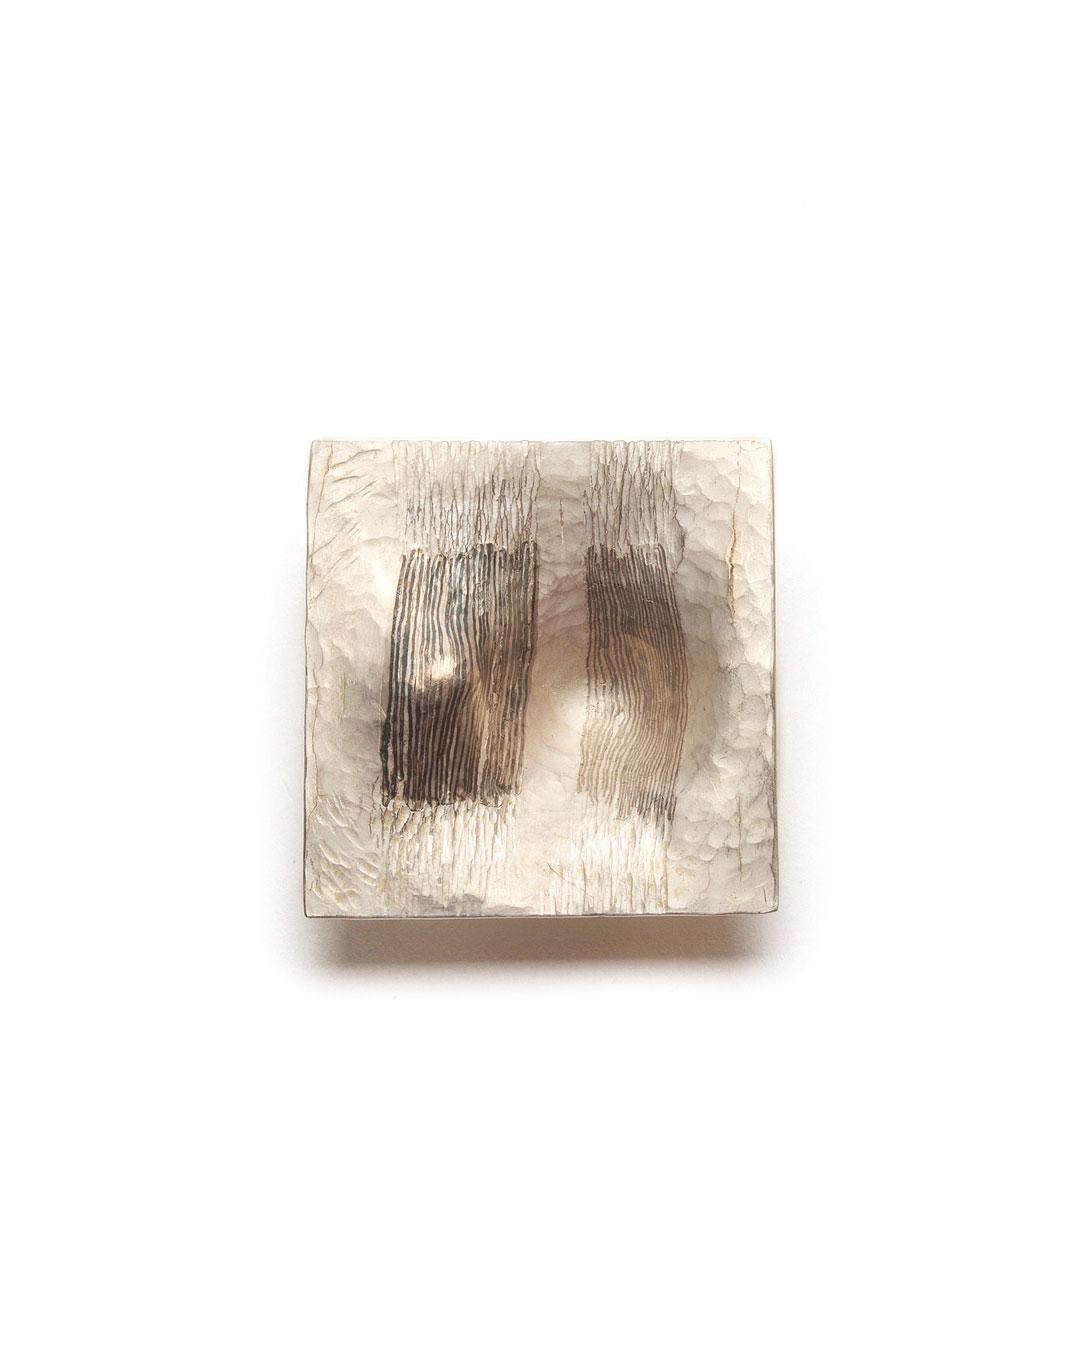 Stefano Marchetti, untitled, 2017, brooch; silver, shibuichi, palladium, 46 x 46 x 20 mm, €8500